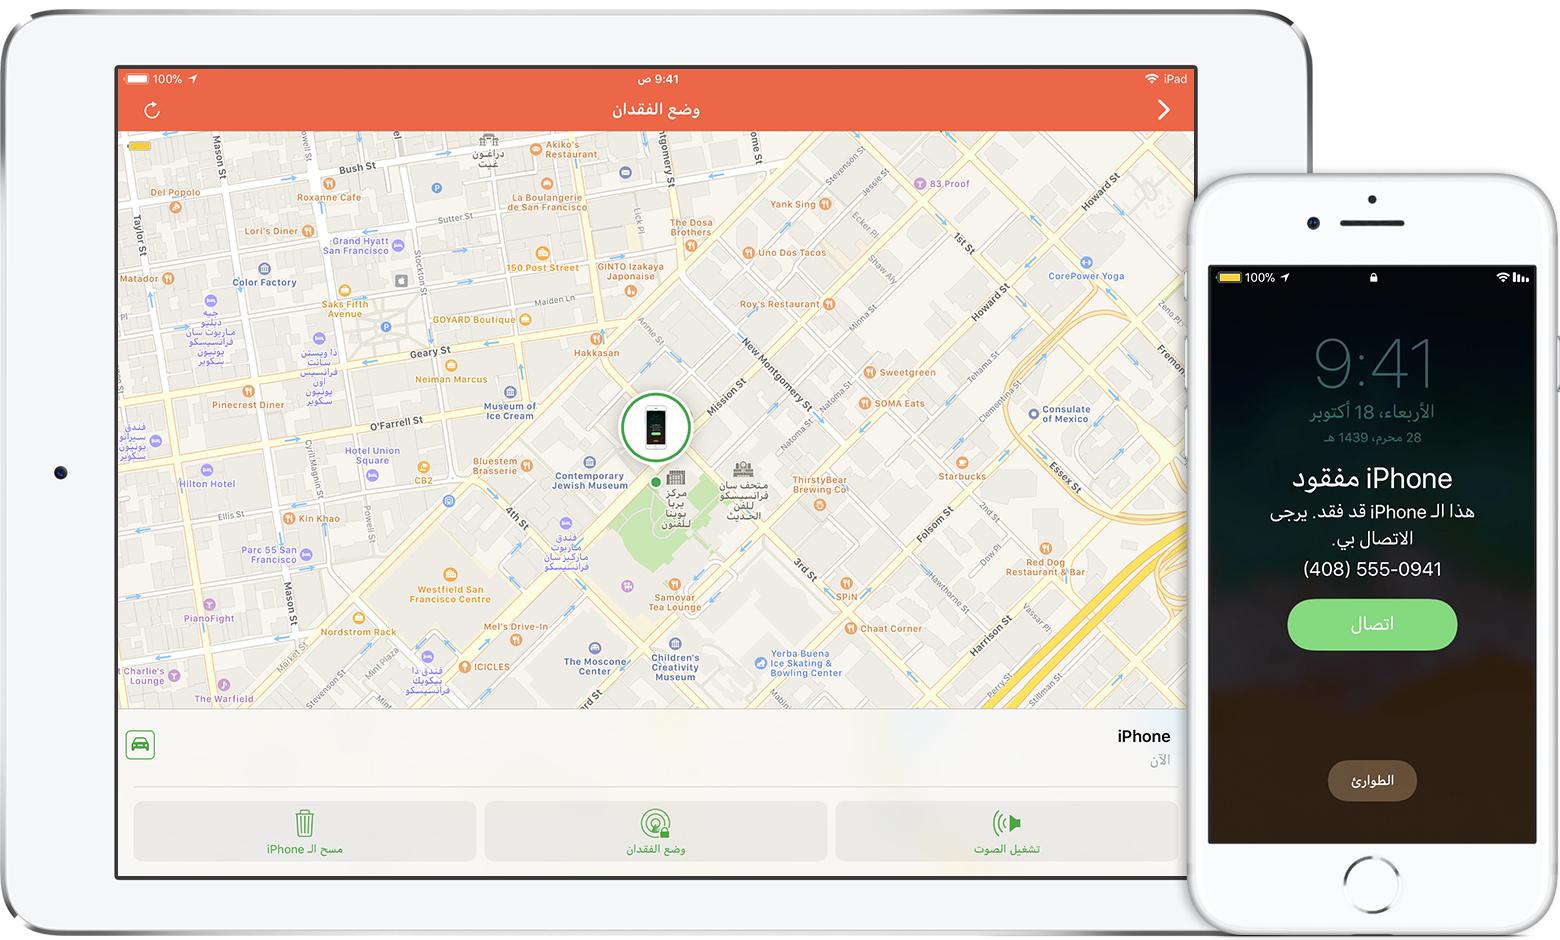 iphone7 ipad ios11 lost mode - هذا ماعليك فعله إذا فقدت آيفون أو آيباد أو سُرِق .. طريقة لاسترجاعه